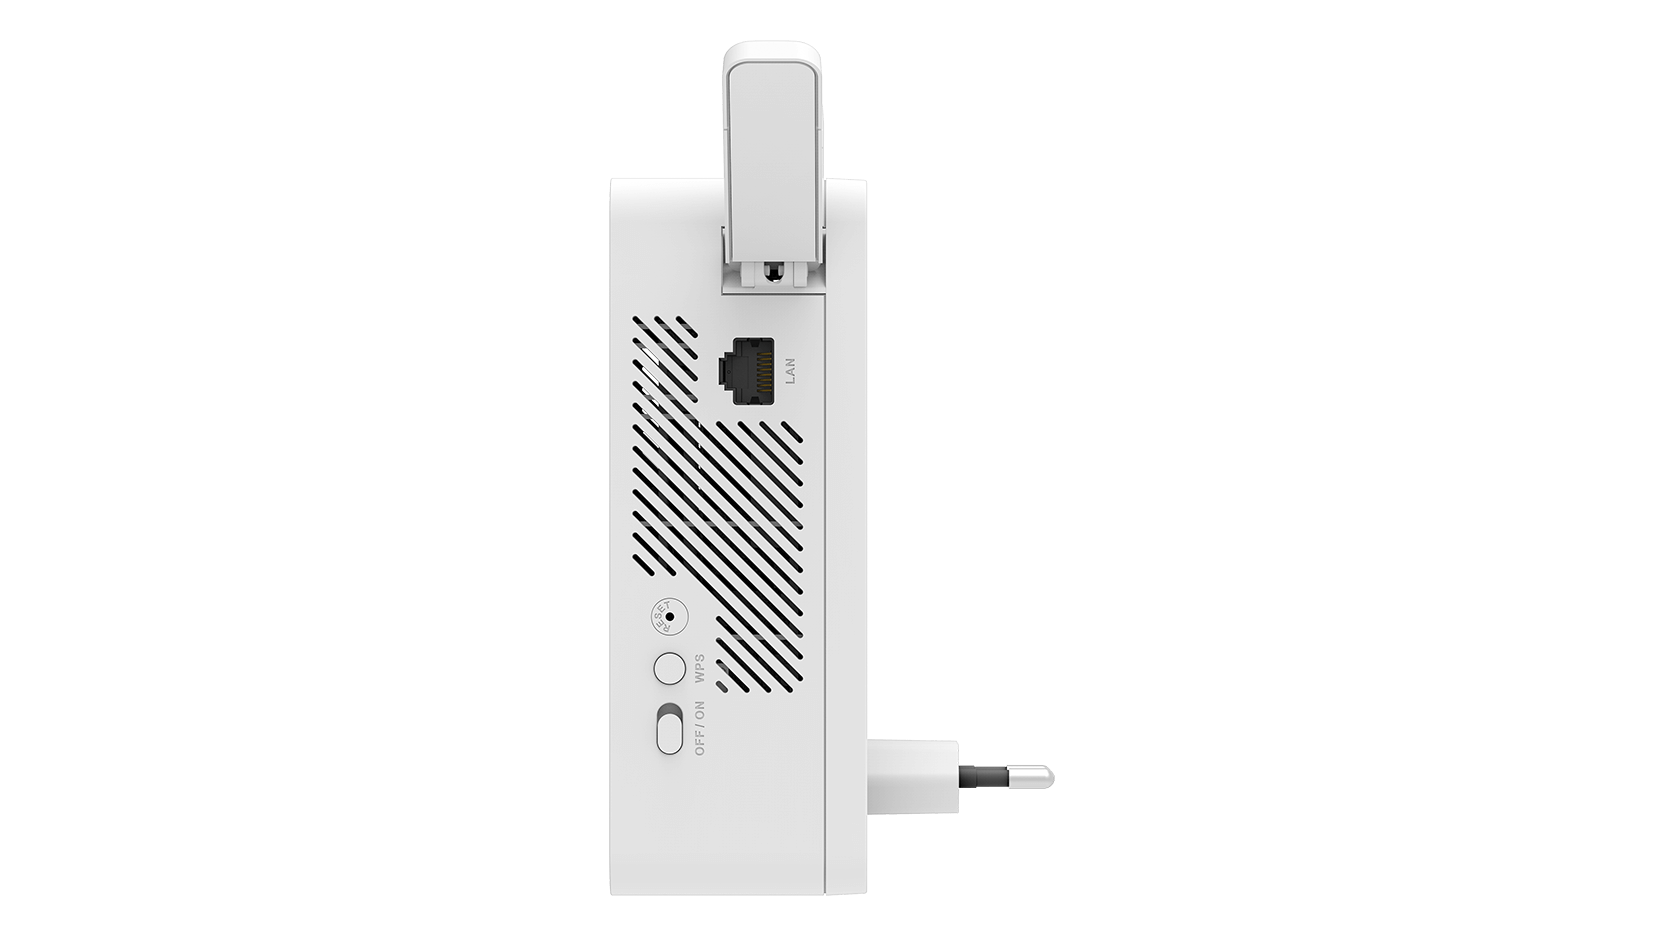 kit PLC PowerLine AV1000 Extensor WiFi AC 1200 de D-Link (3)